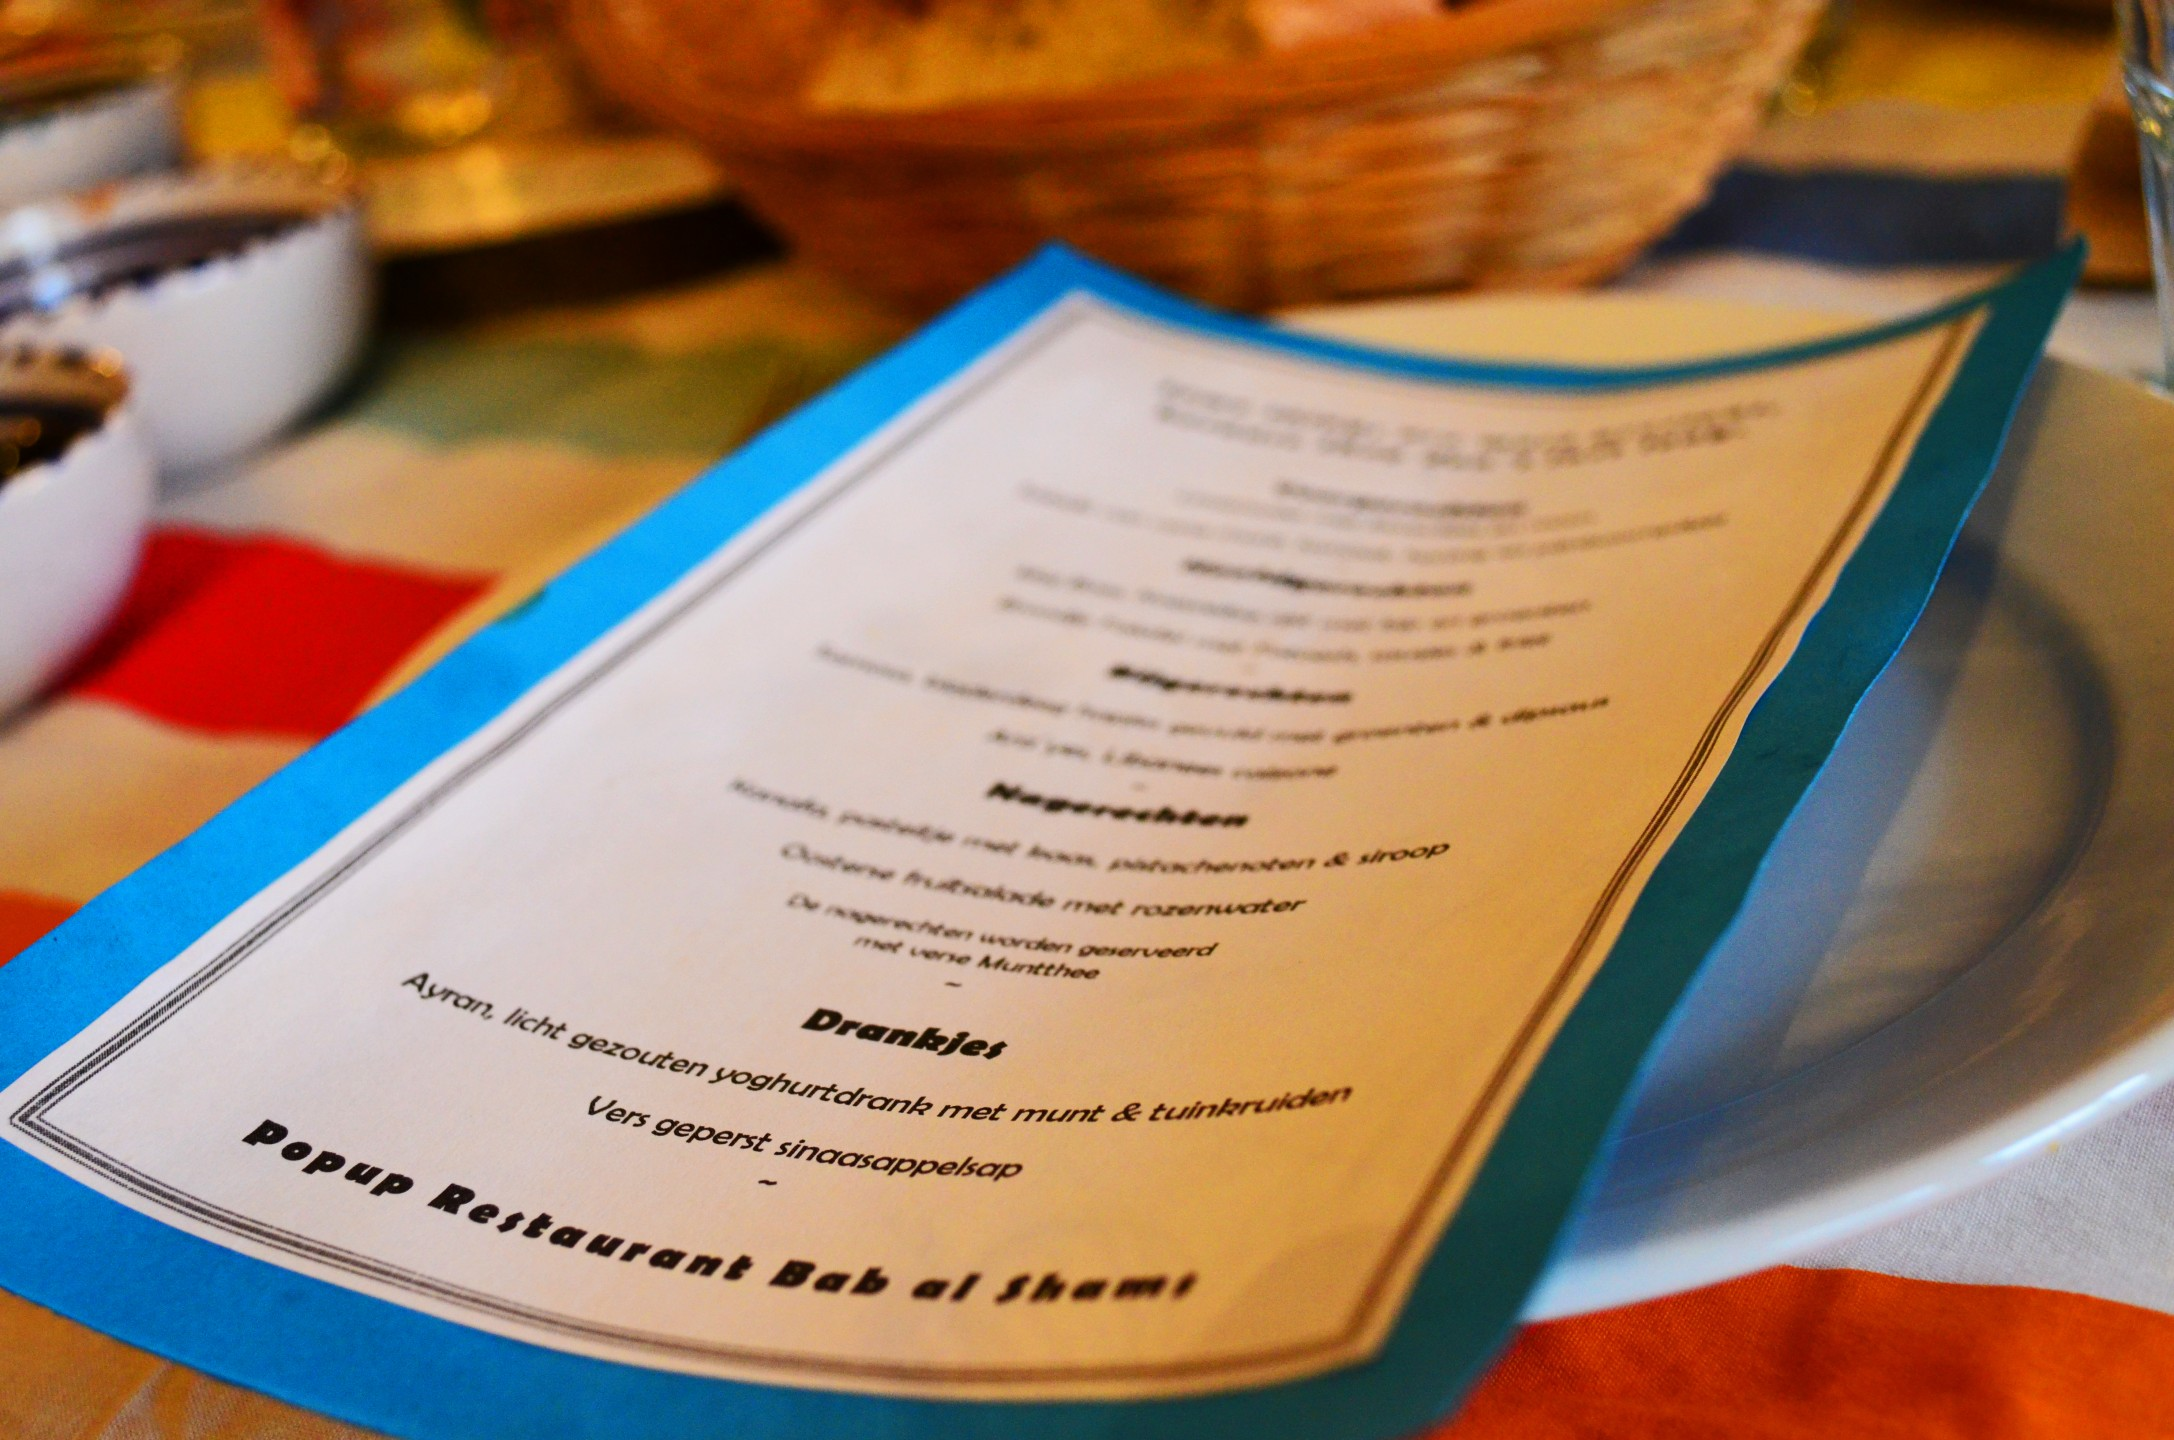 Pop-up restaurant Bab al Shams